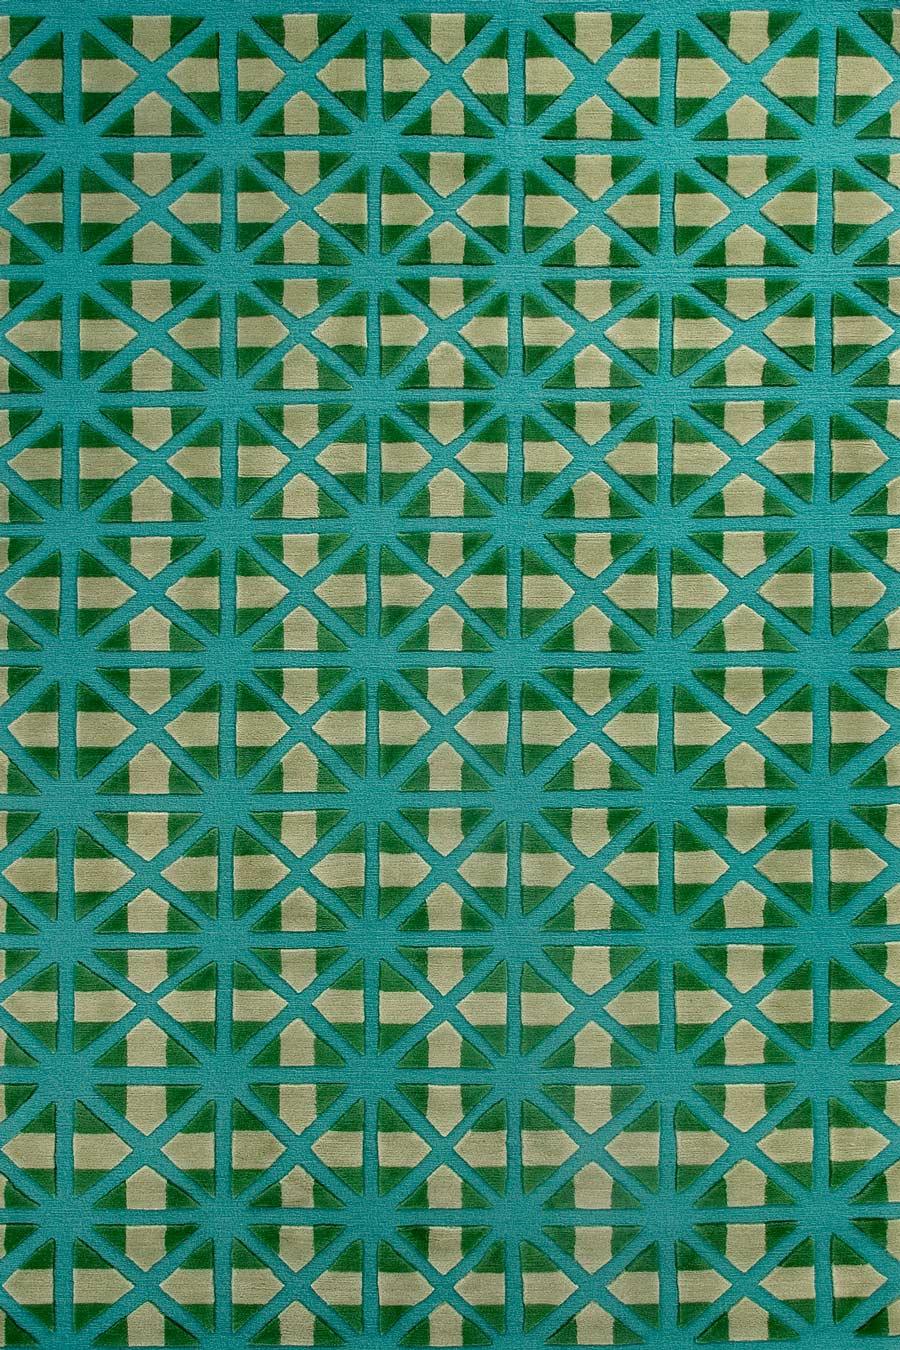 overhead of bias rug by bernabeifreeman in blue and green repeat geometric pattern